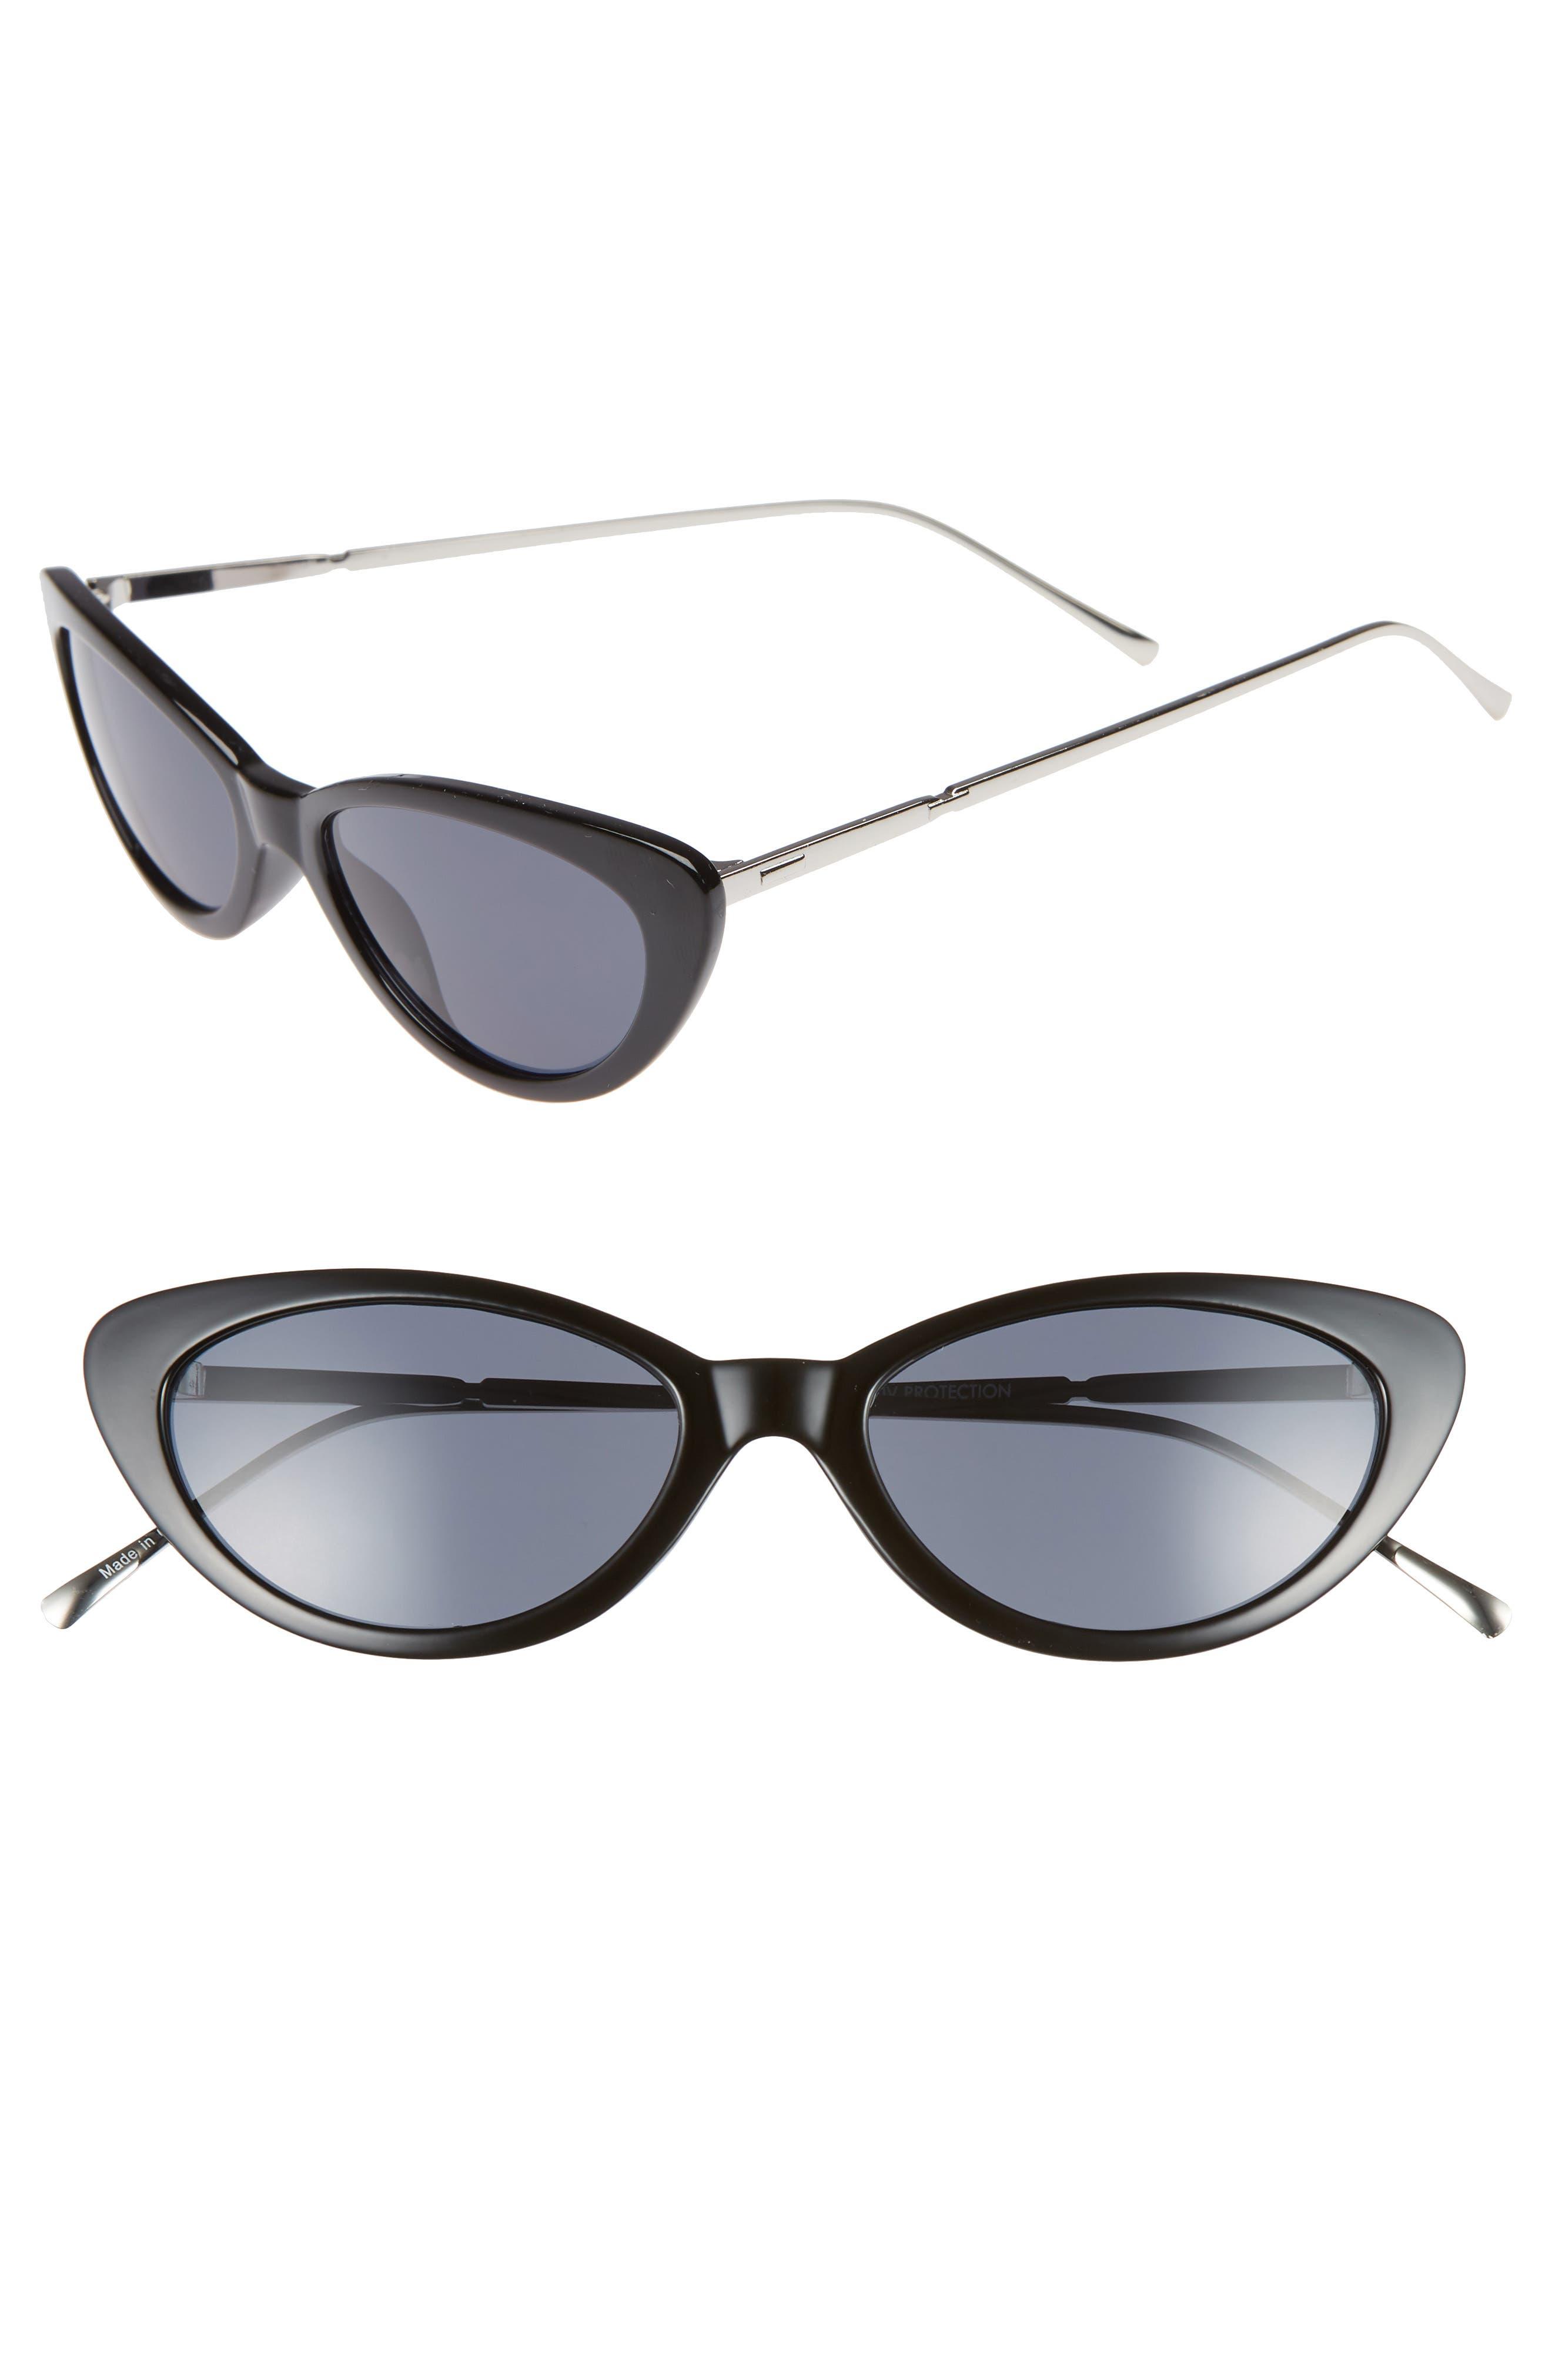 53mm Cat Eye Sunglasses,                             Main thumbnail 1, color,                             BLACK